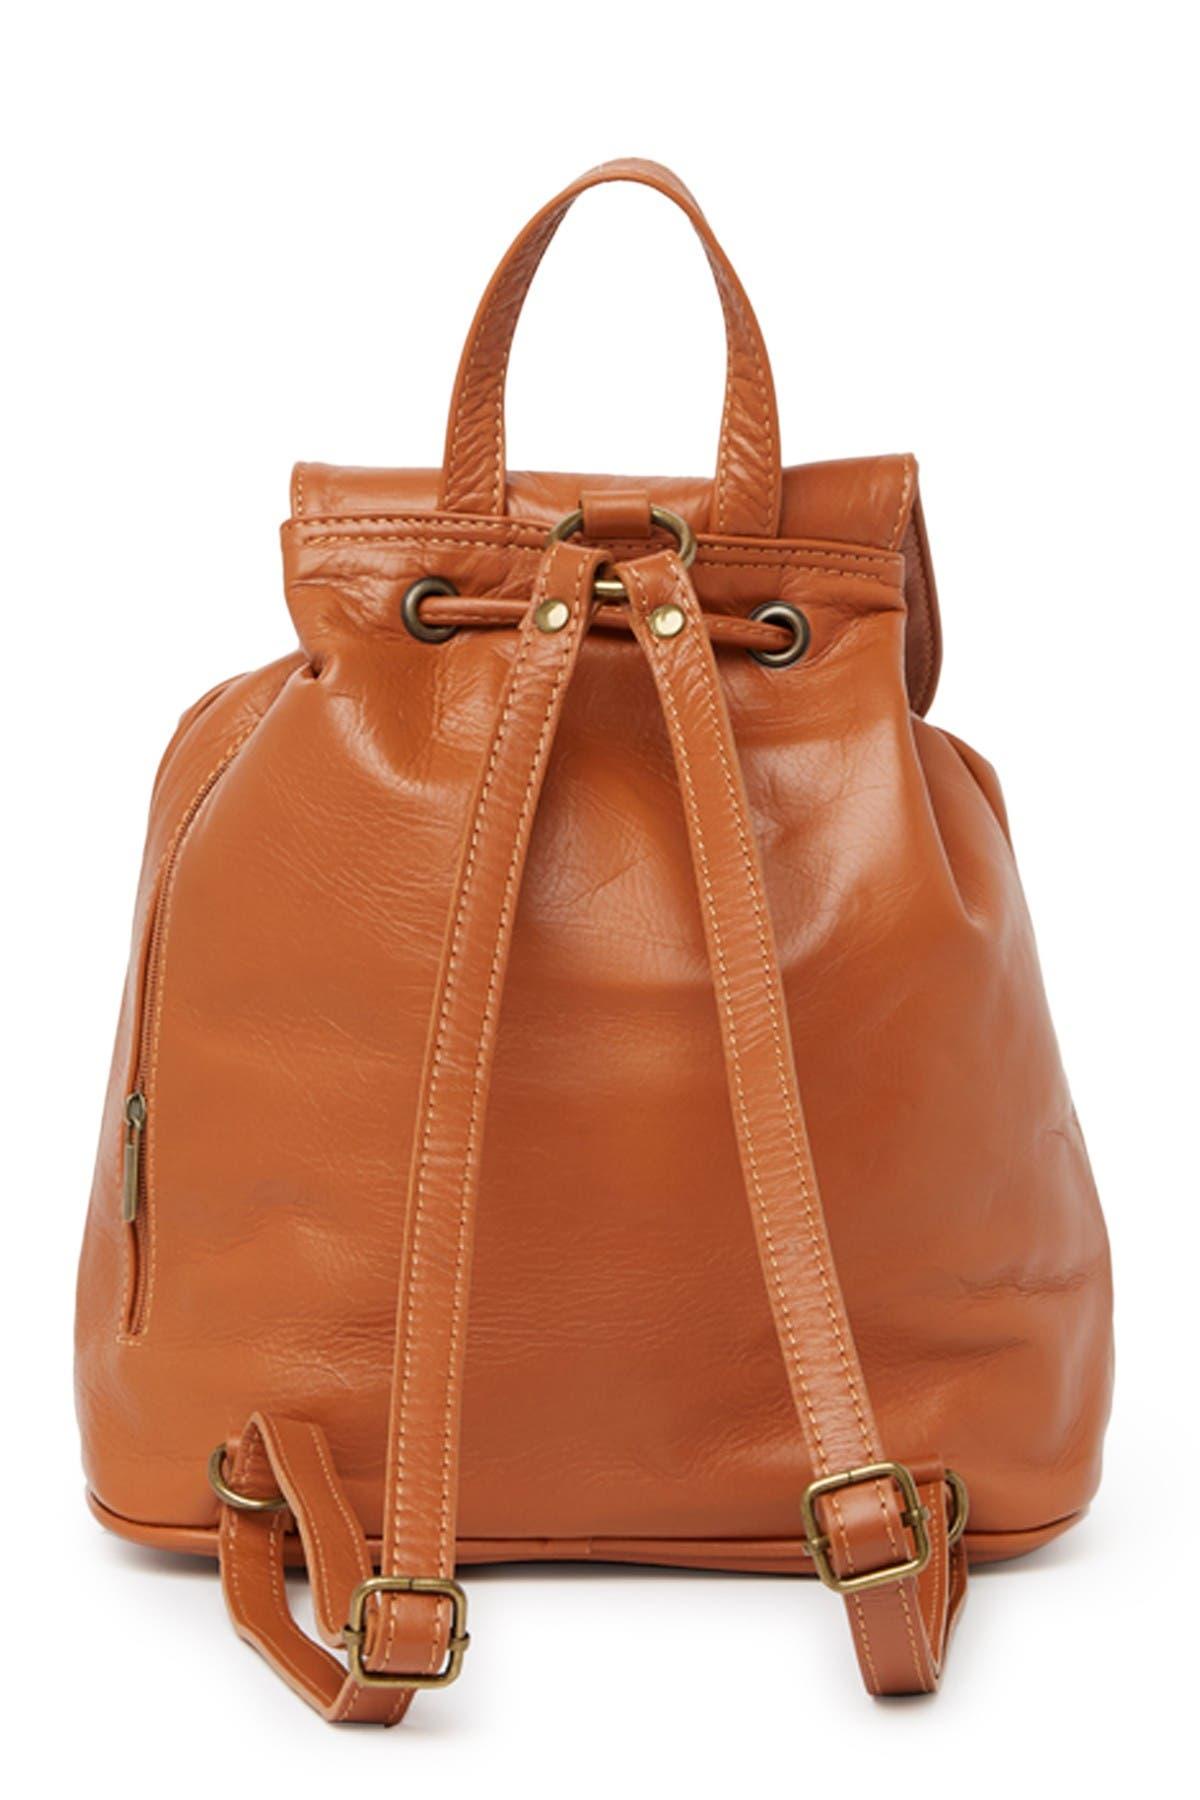 Image of Sofia Cardoni Leather Backpack